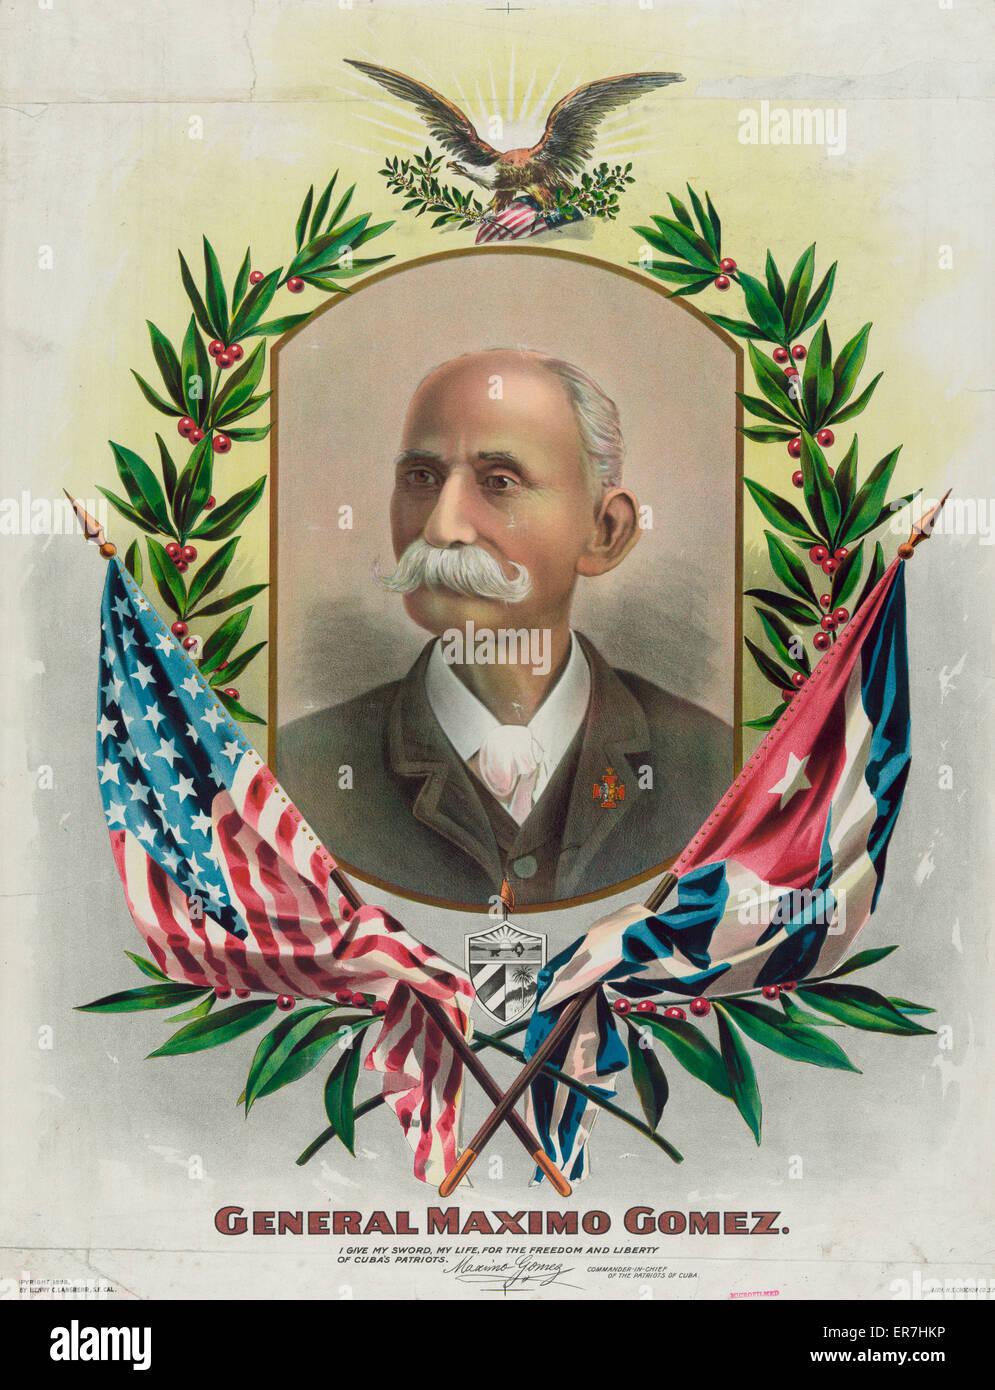 General Maximo Gomez. - Stock Image